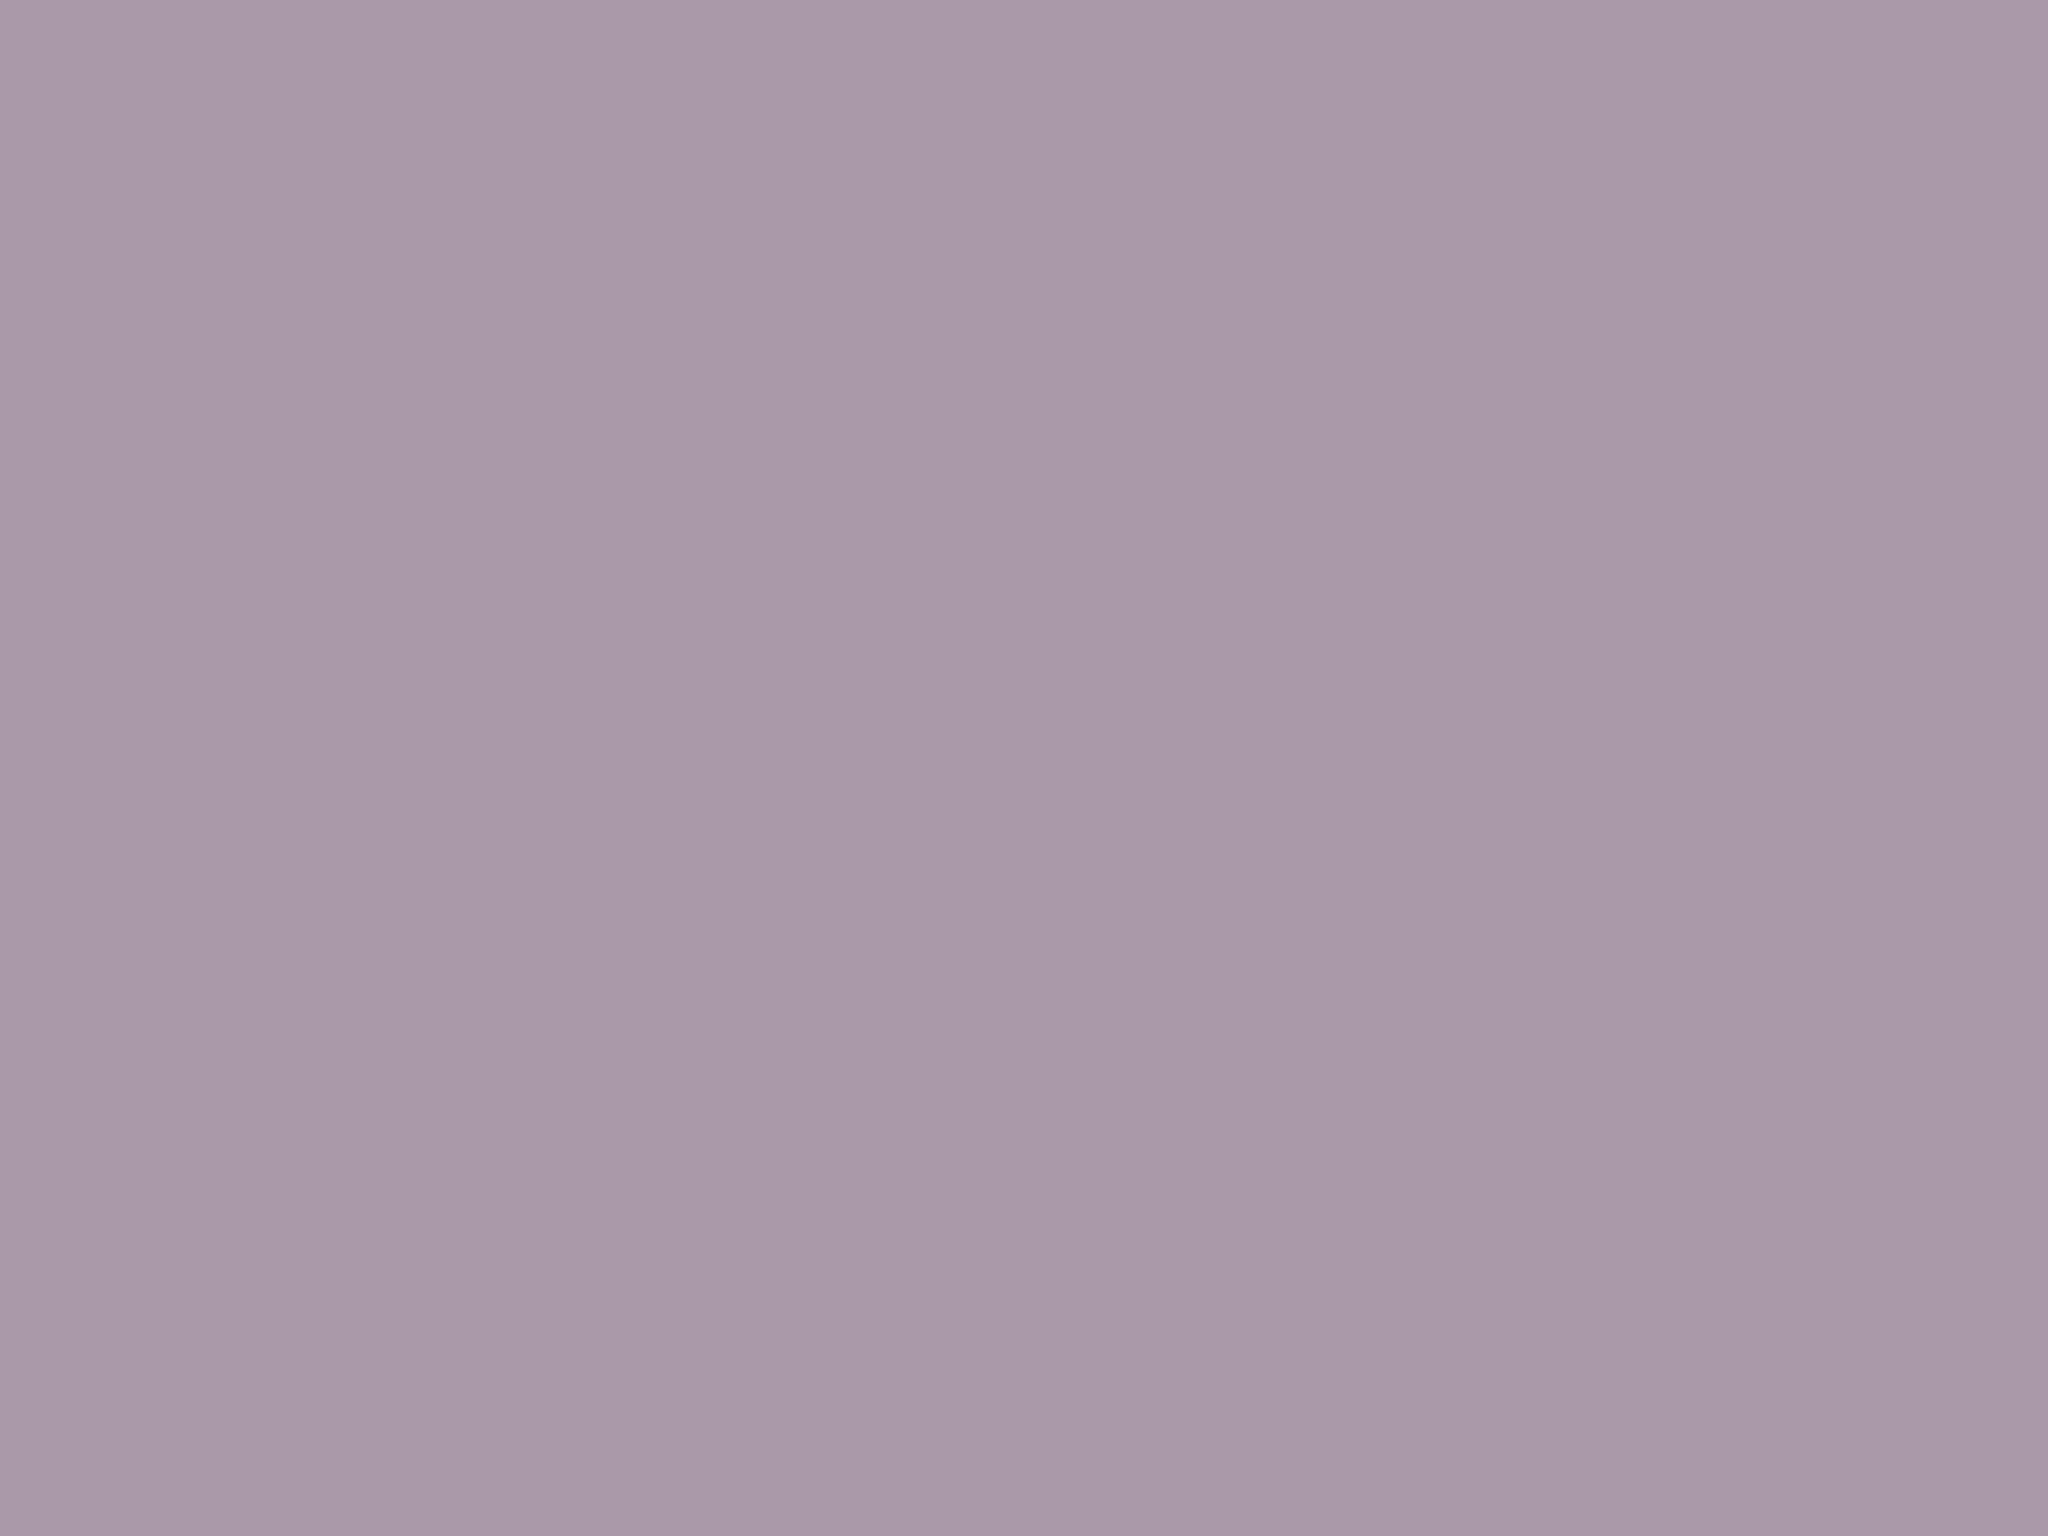 2048x1536 Rose Quartz Solid Color Background